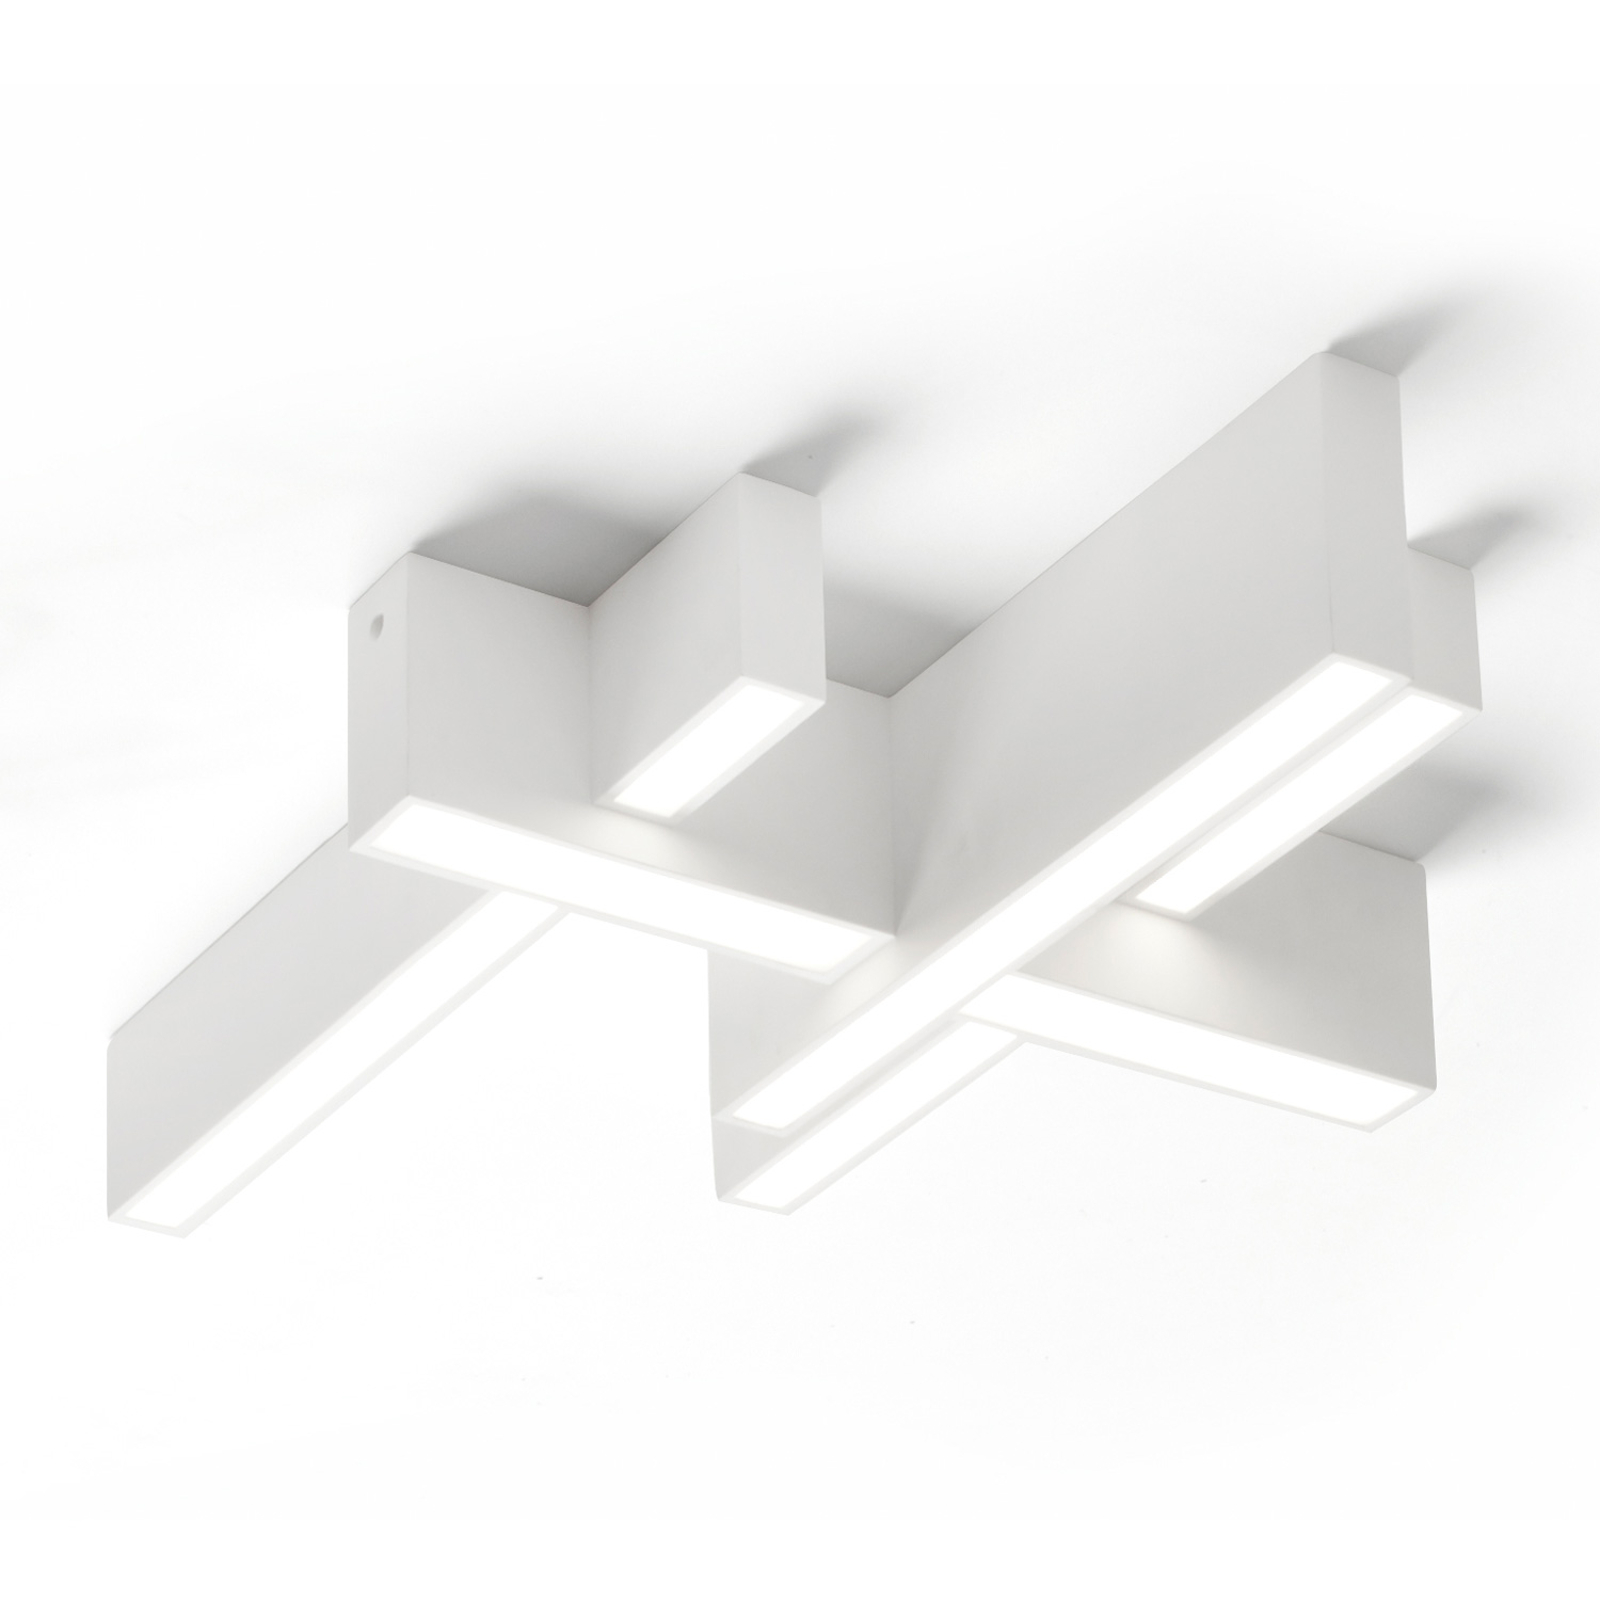 Lampa sufitowa LED Magnesia T277, 4 belki